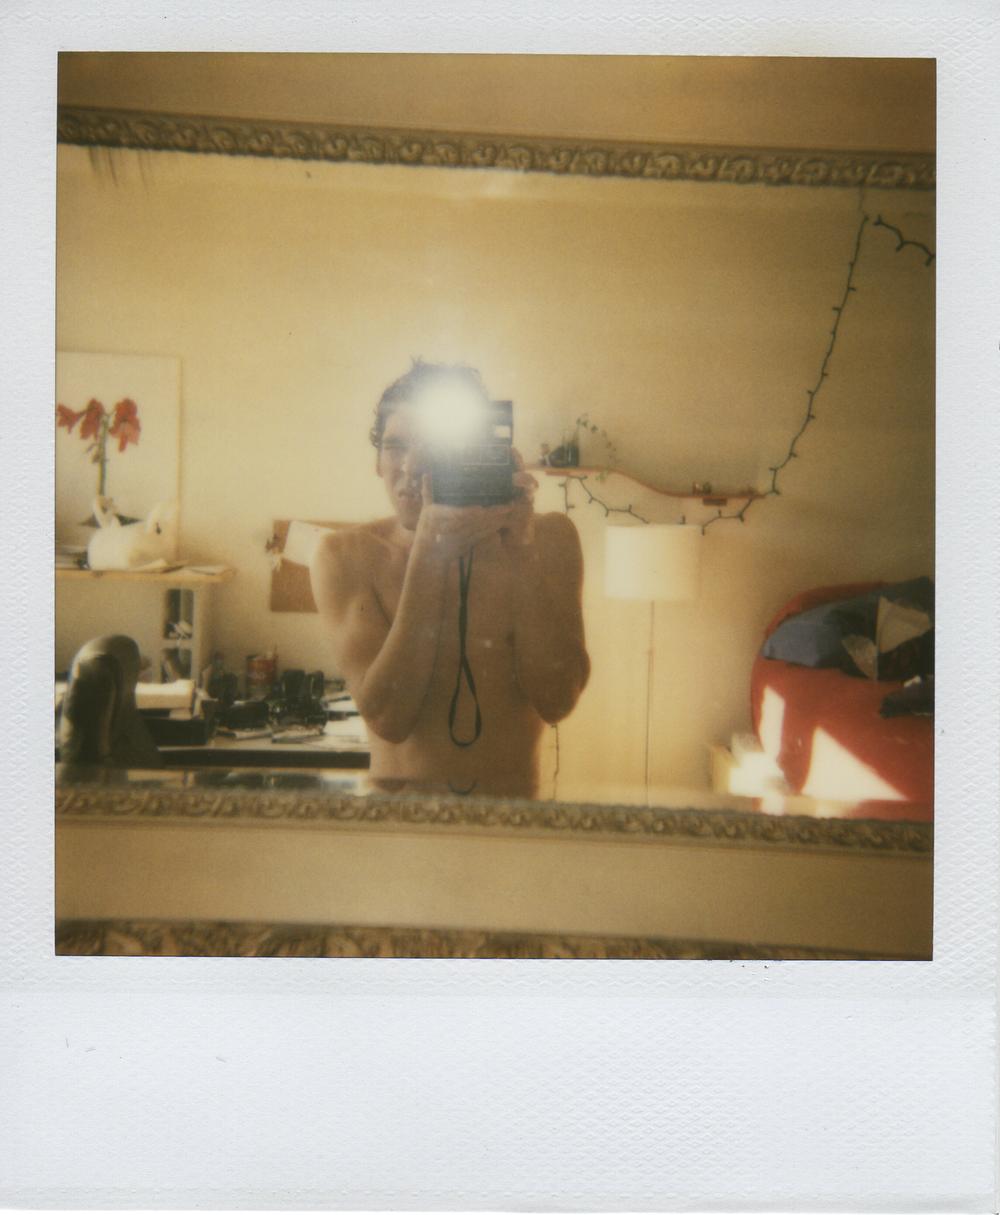 jlaurence-polaroid-026.jpg